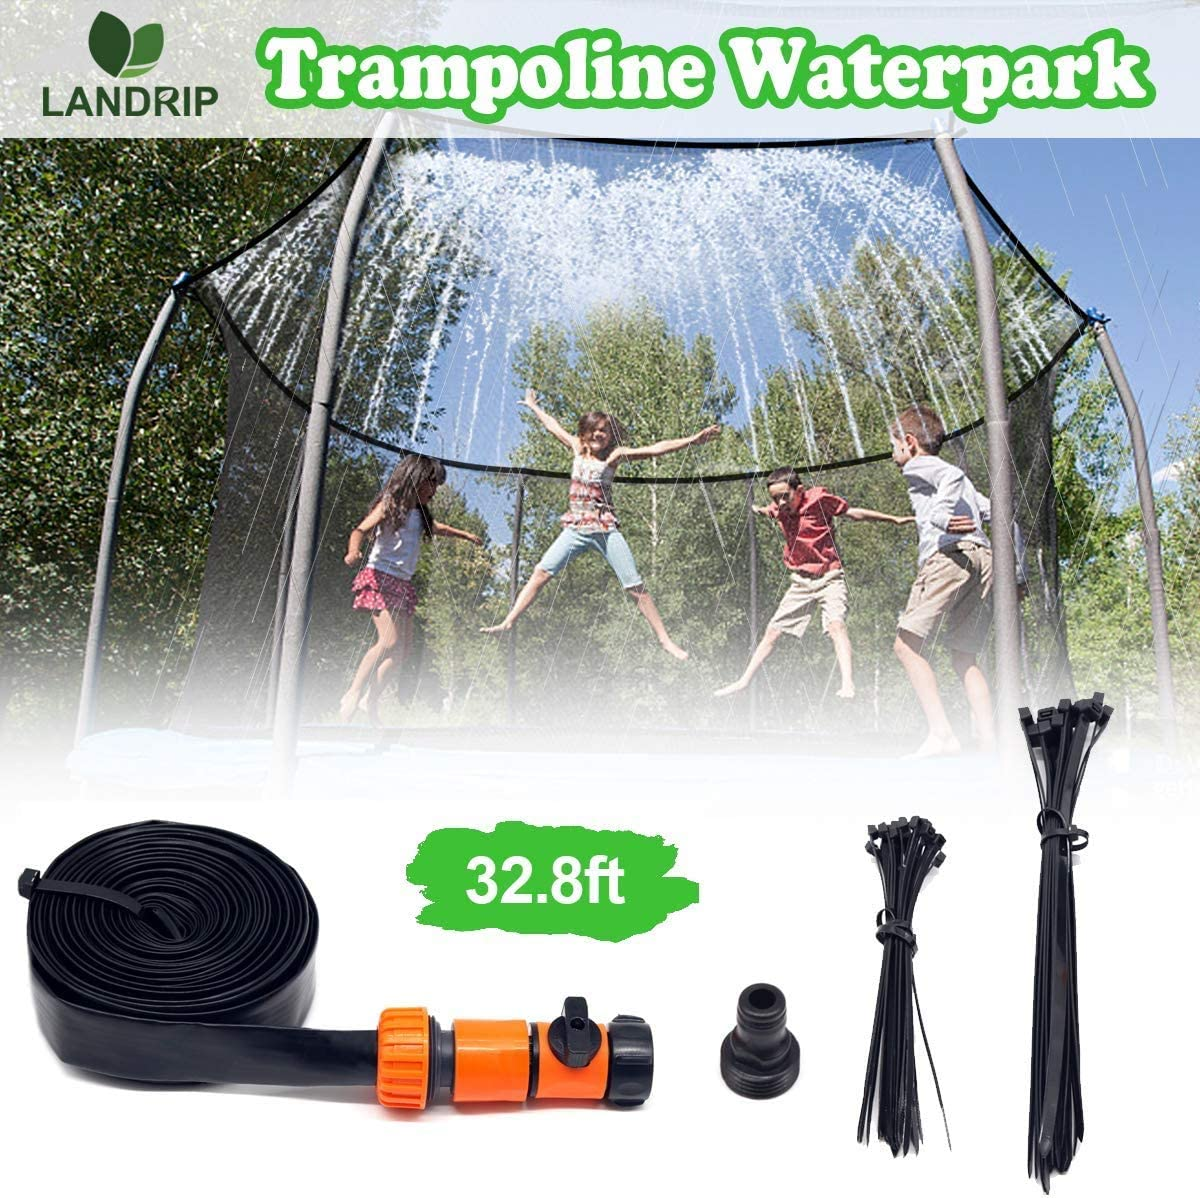 Bluexury Trampoline Sprinklers Hose for Kids,Boys Girls Fun Summer Outdoor Water Park Game Sprinkler Accessories